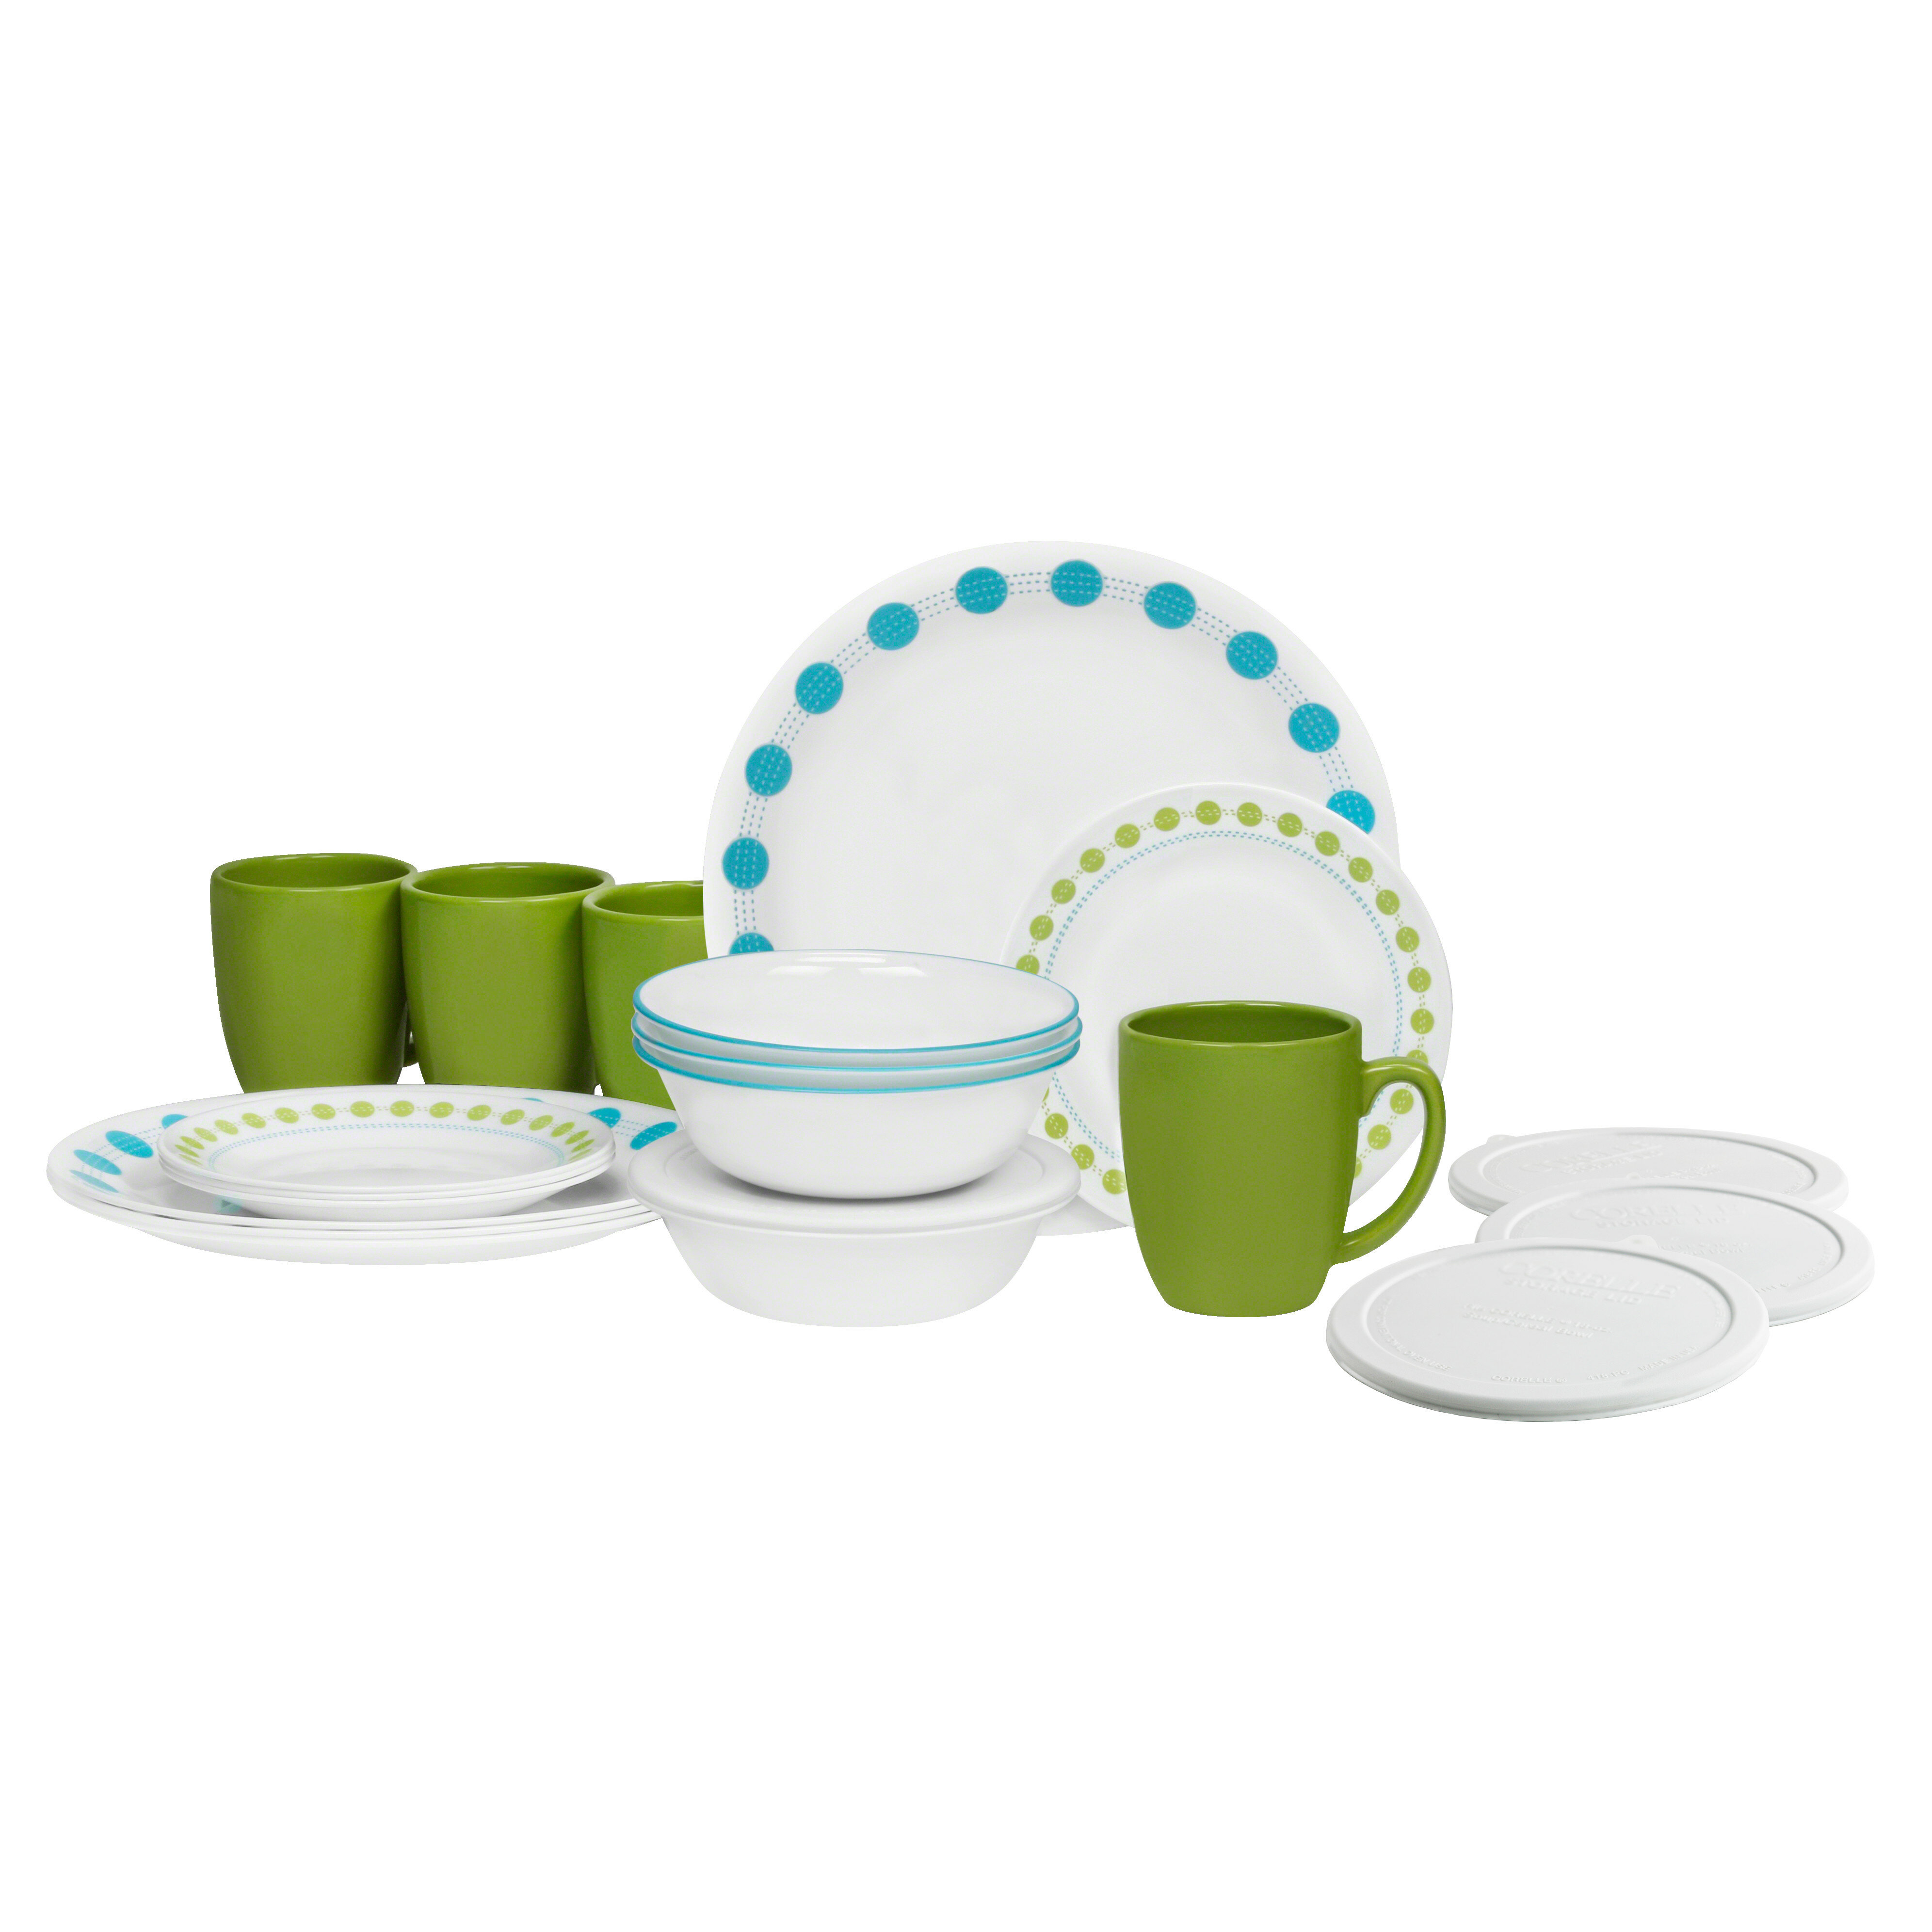 Corelle Livingware 20 Piece Dinnerware Set Service for 4 u0026 Reviews | Wayfair  sc 1 st  Wayfair & Corelle Livingware 20 Piece Dinnerware Set Service for 4 u0026 Reviews ...